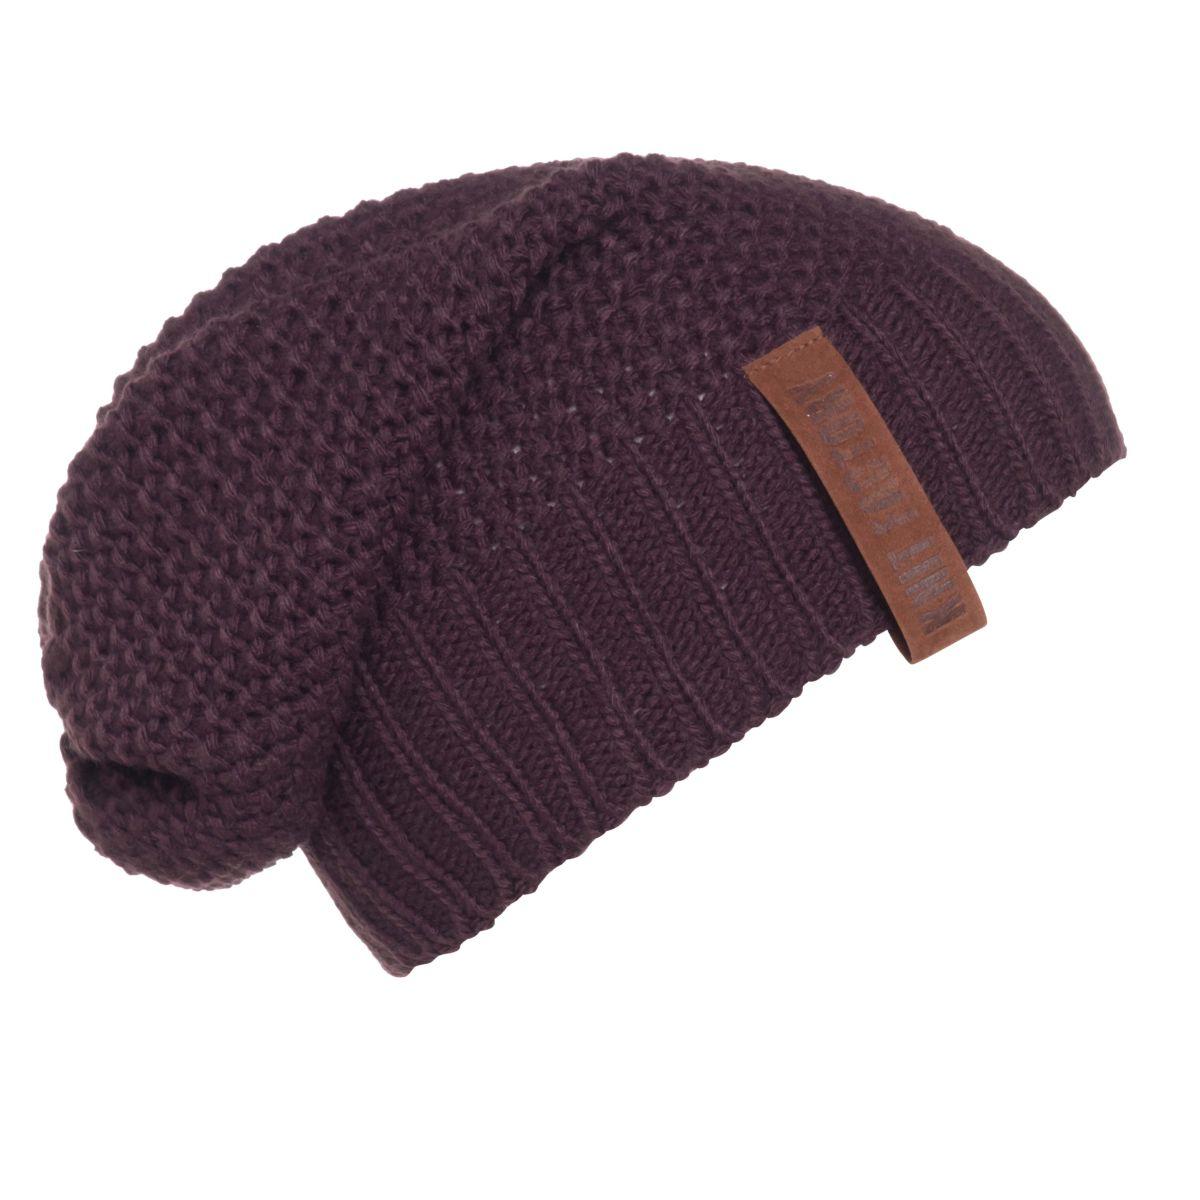 knit factory kf12007002350 coco beanie aubergine 1